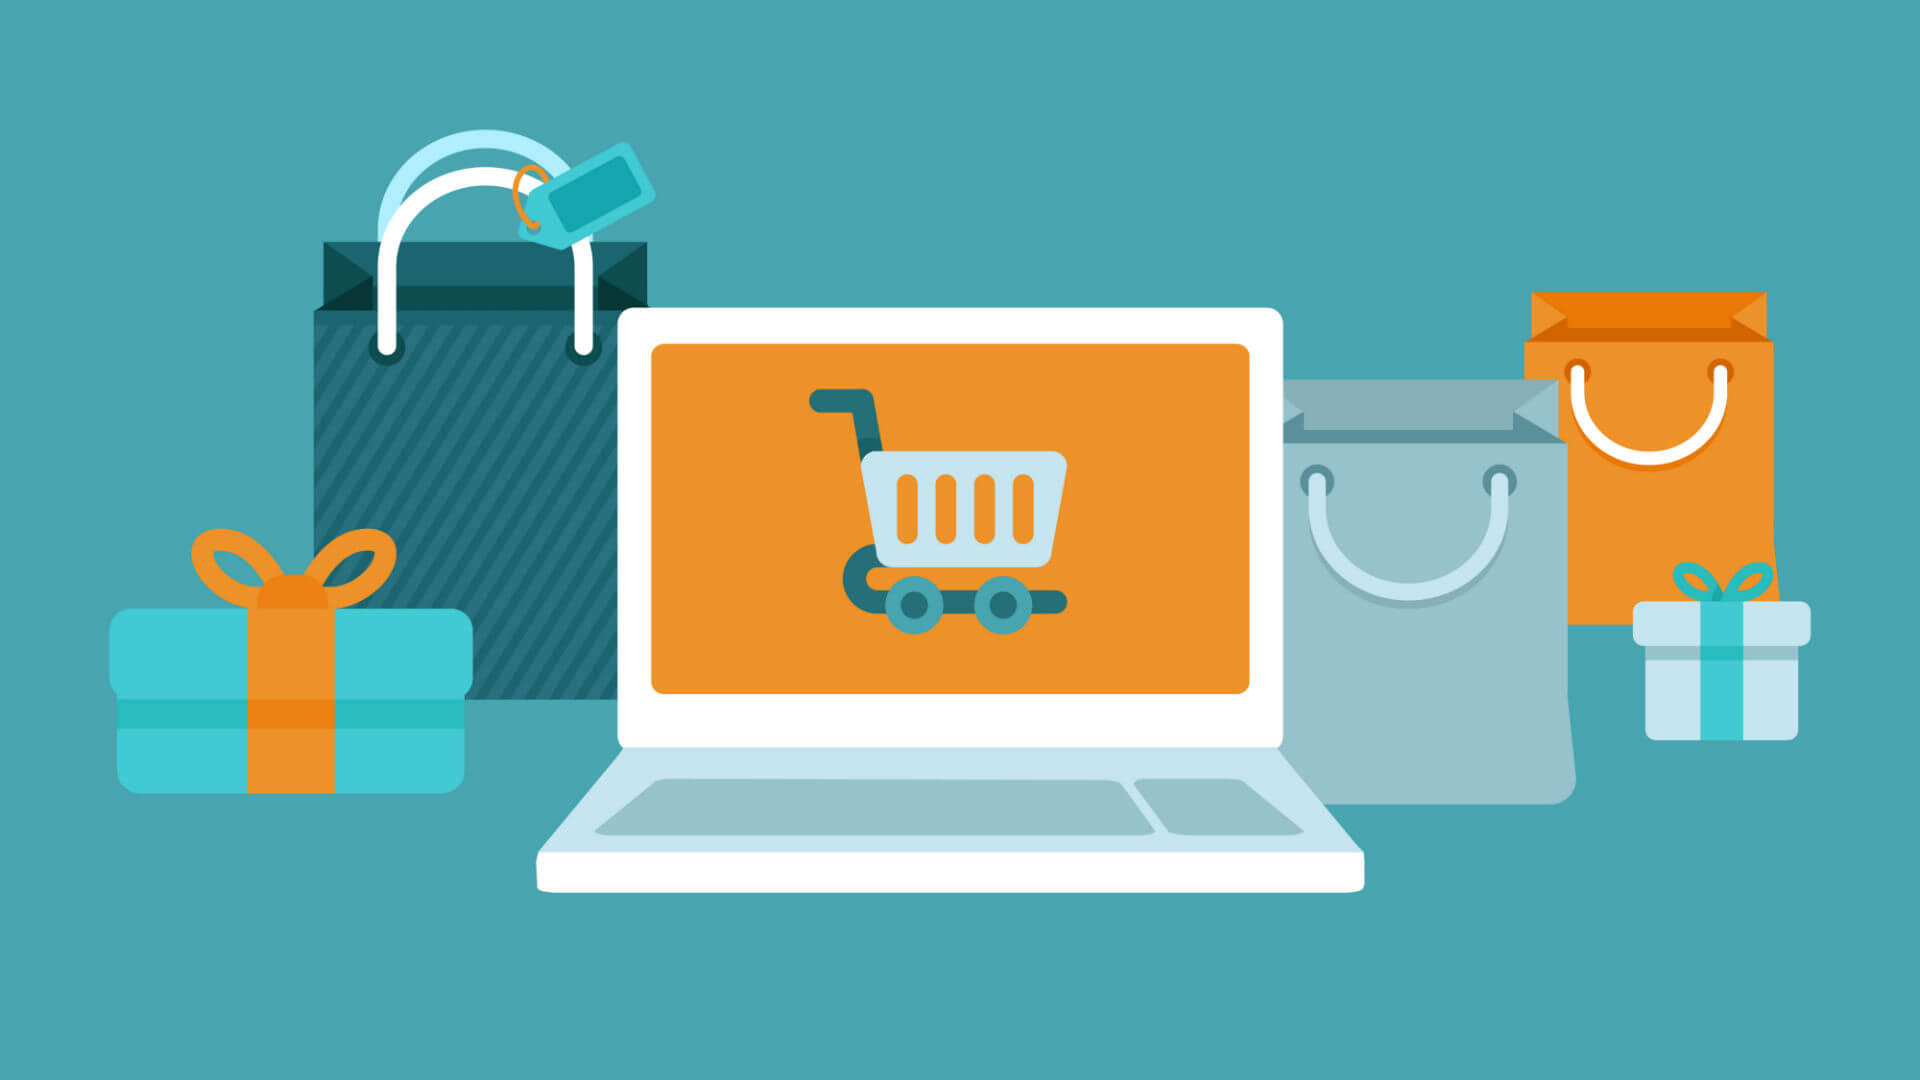 https://www.novalnet-solutions.com/wp-content/uploads/2021/03/ecommerce-shopping-retail-ss-1920.jpg